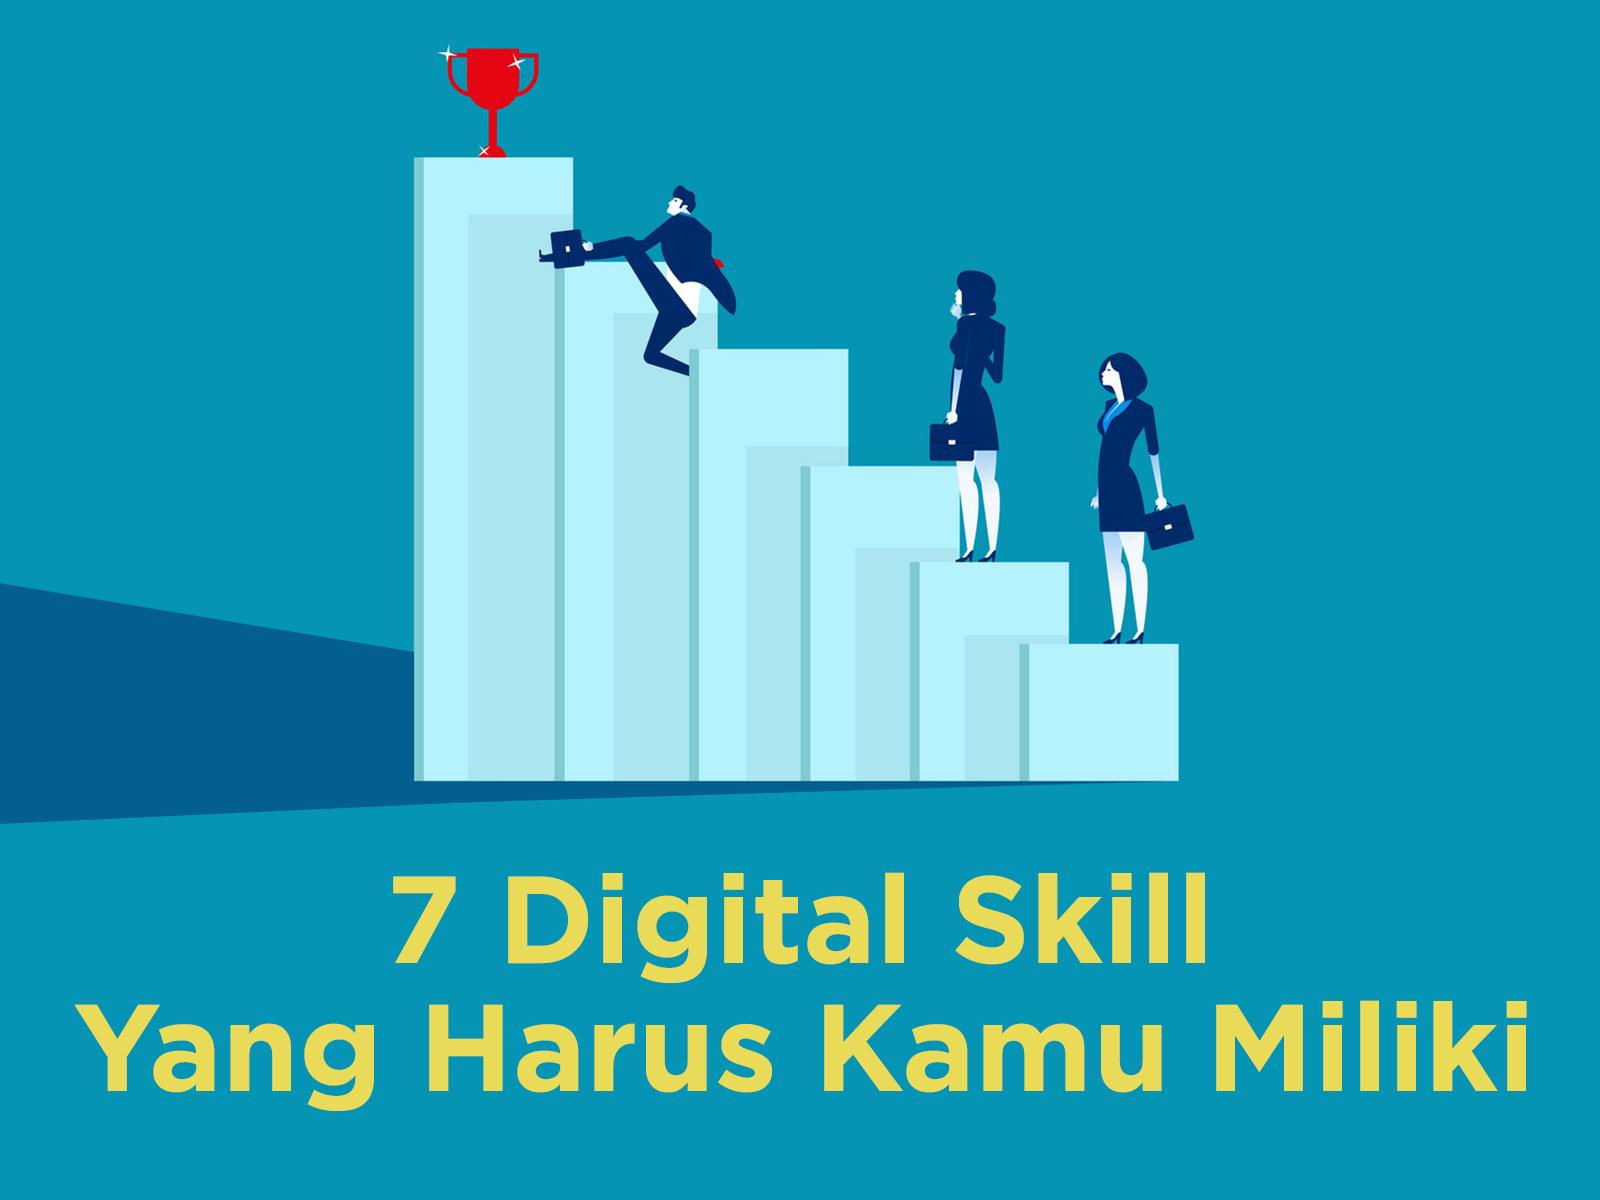 Digital Skill yang Wajib Dimiliki